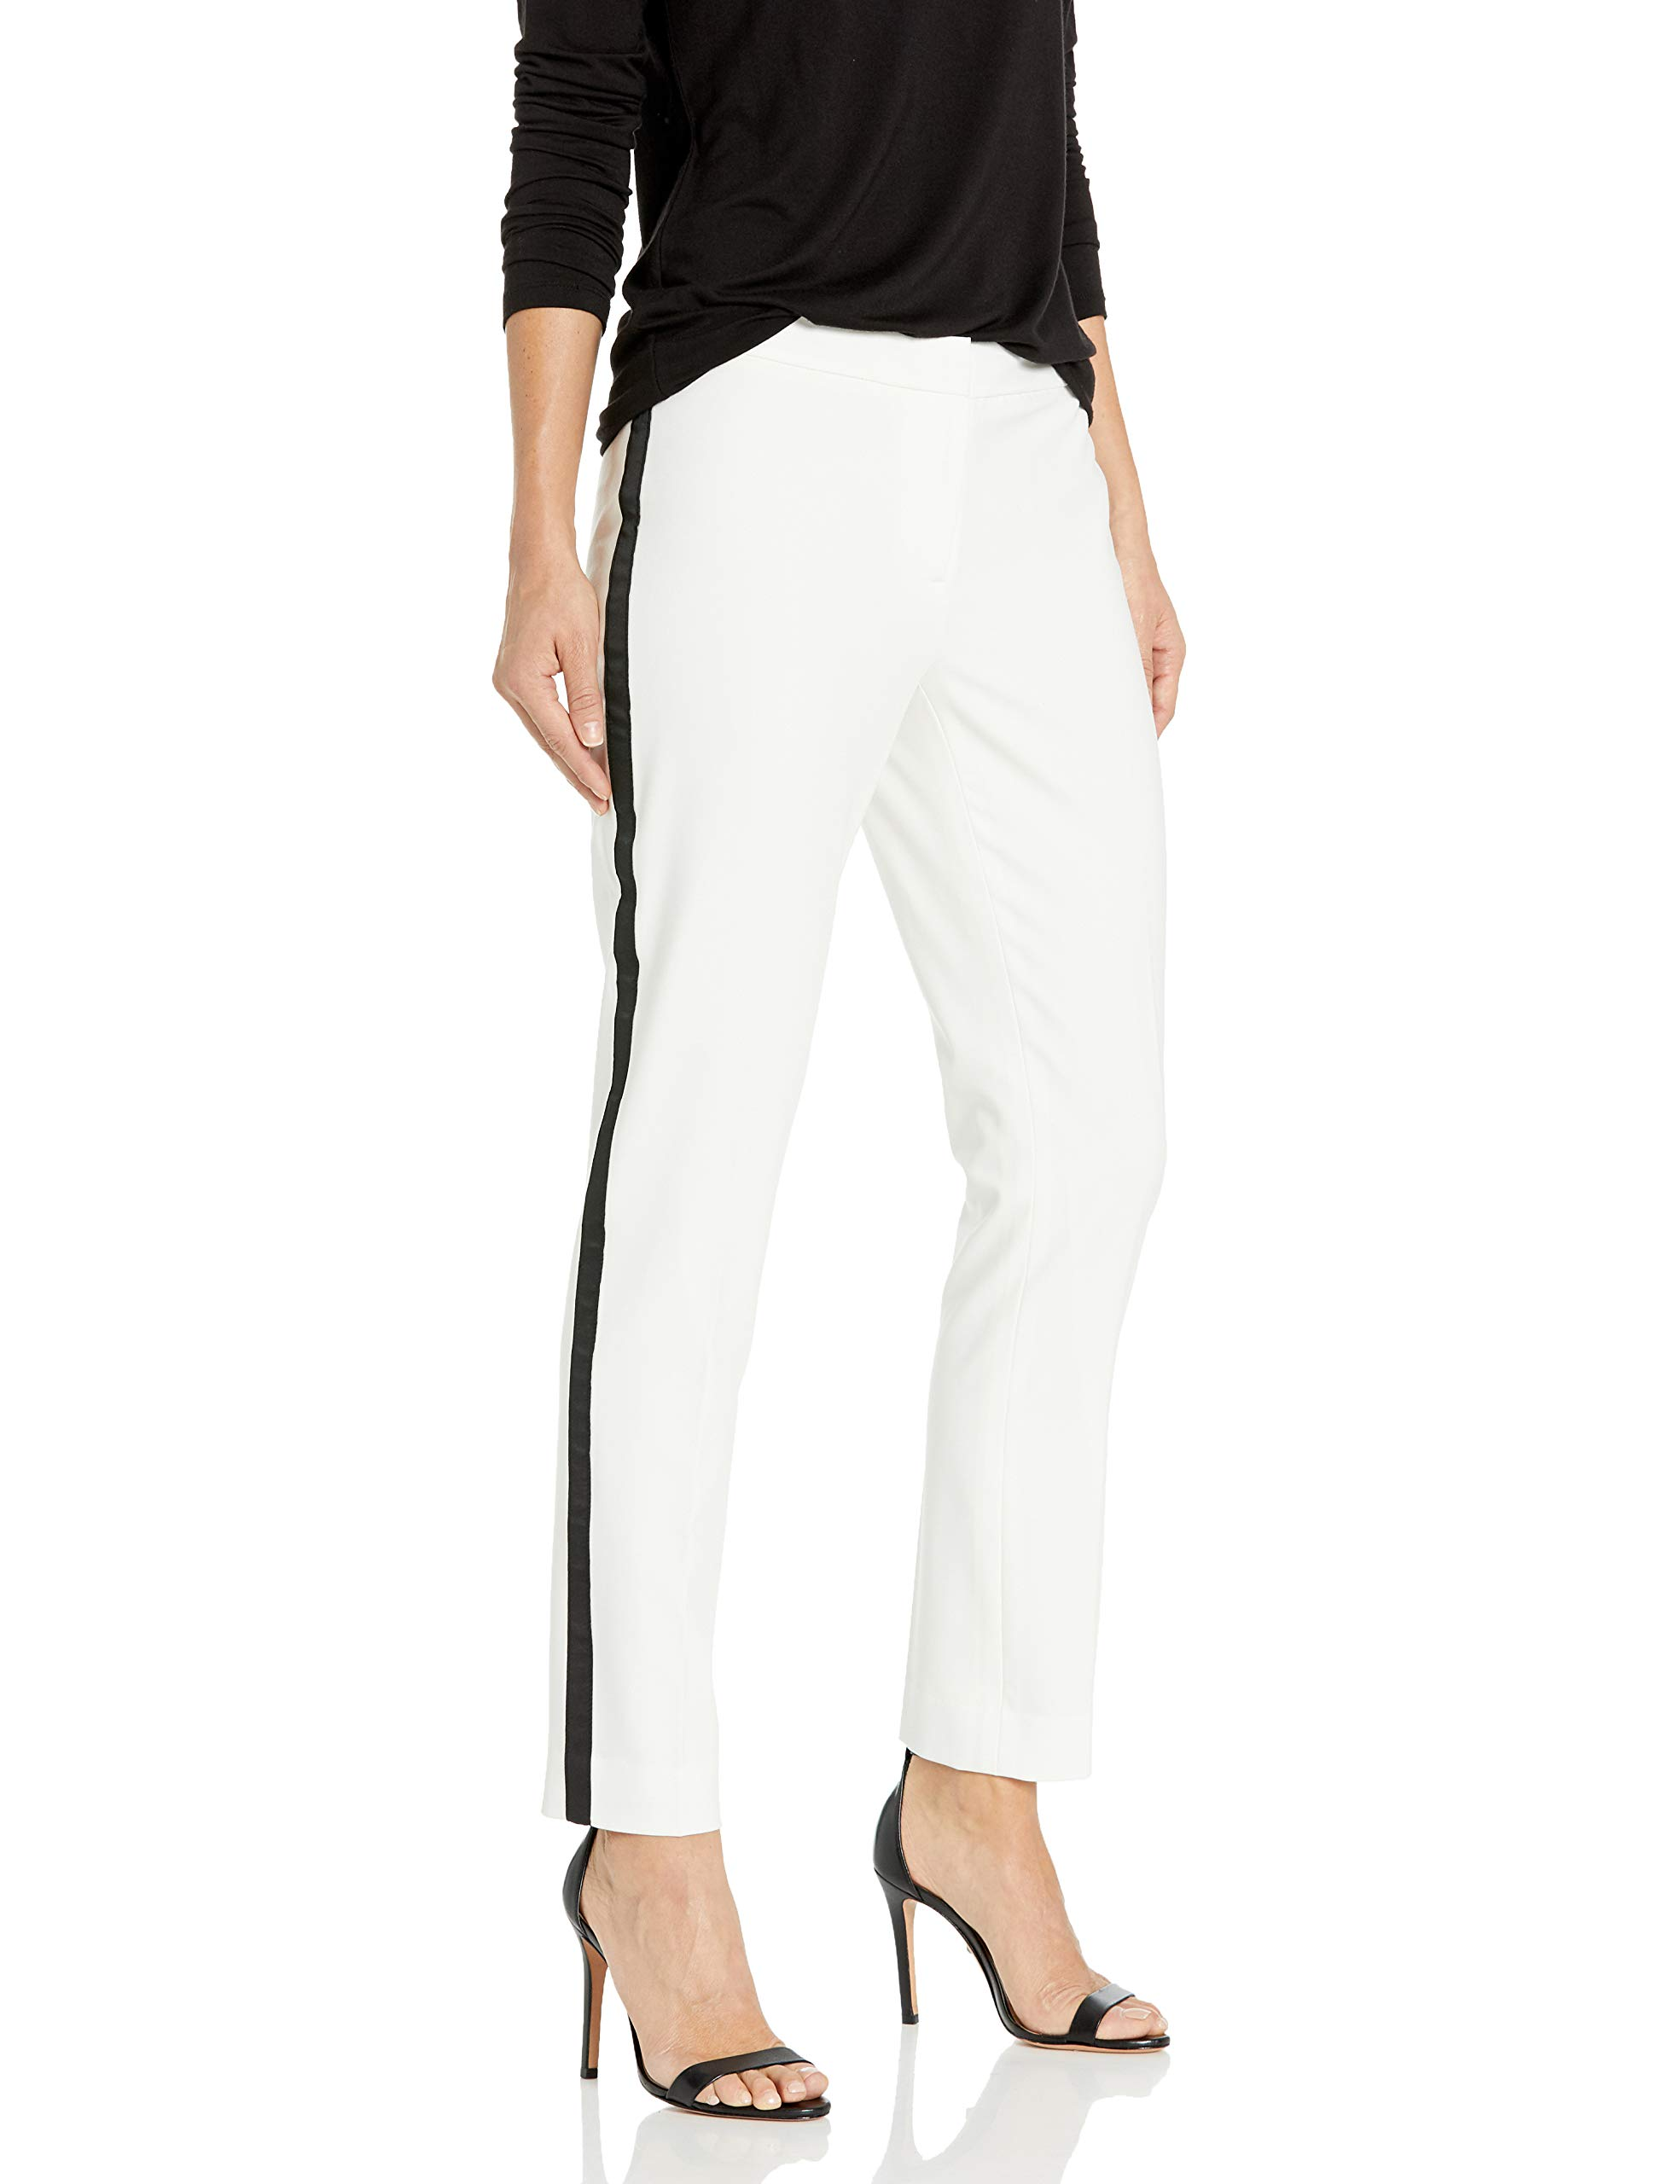 Calvin Klein Women's Tuxedo Pant